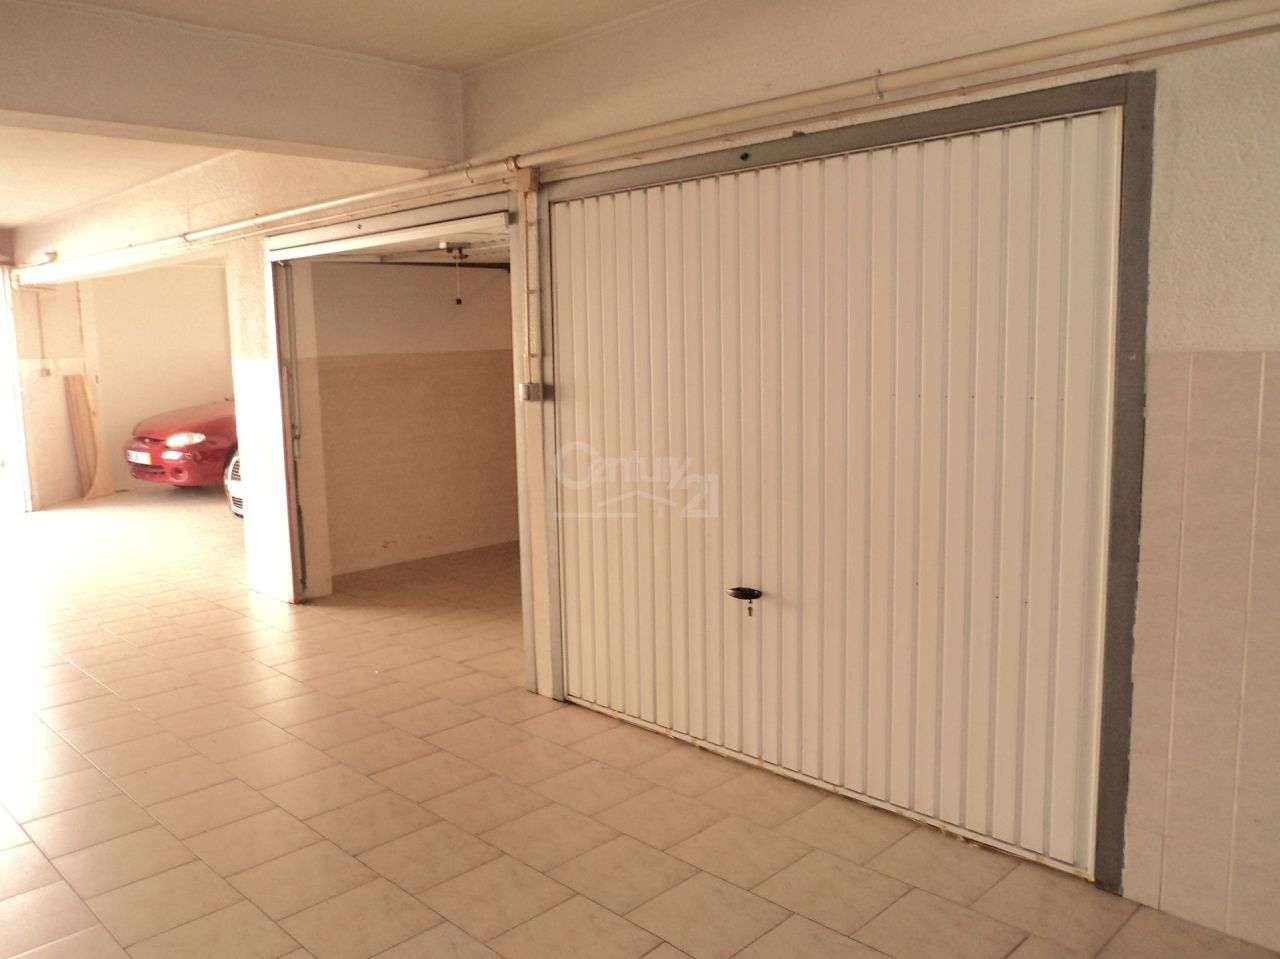 Apartamento para arrendar, Barcarena, Lisboa - Foto 16